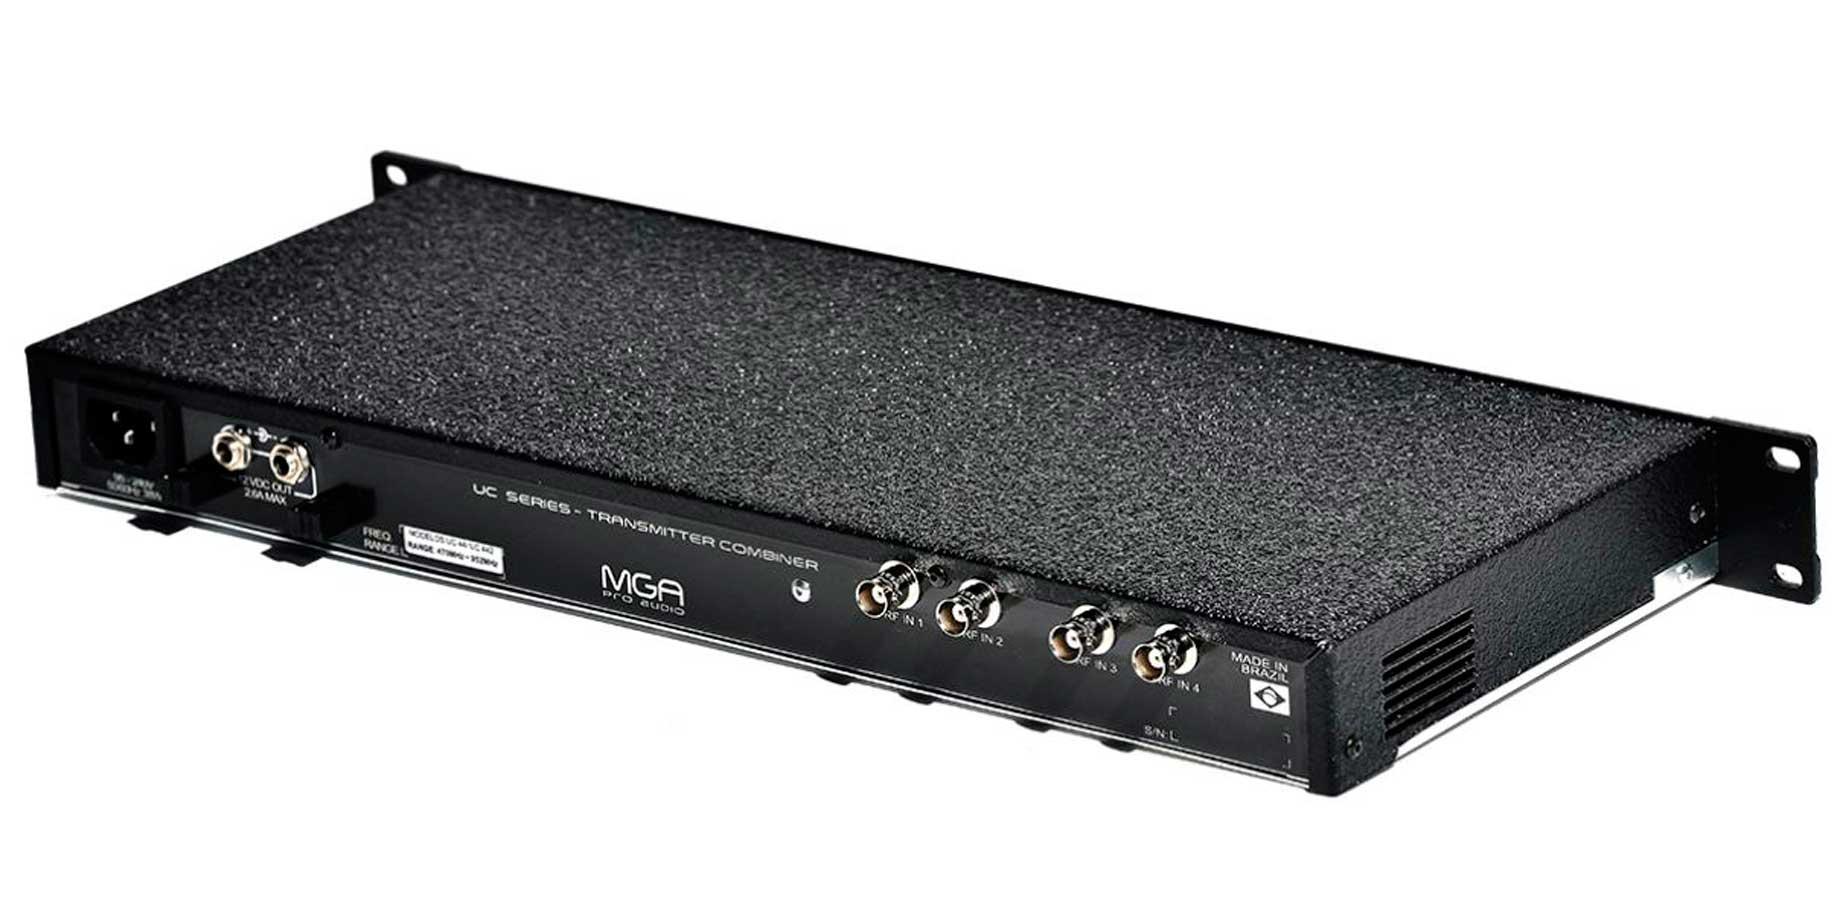 Sistema de RF para IEM | 1 Combiner, 1 Antena e 1 cabo 10 metros | MGA Pro Audio | UC-44 2100 A-1